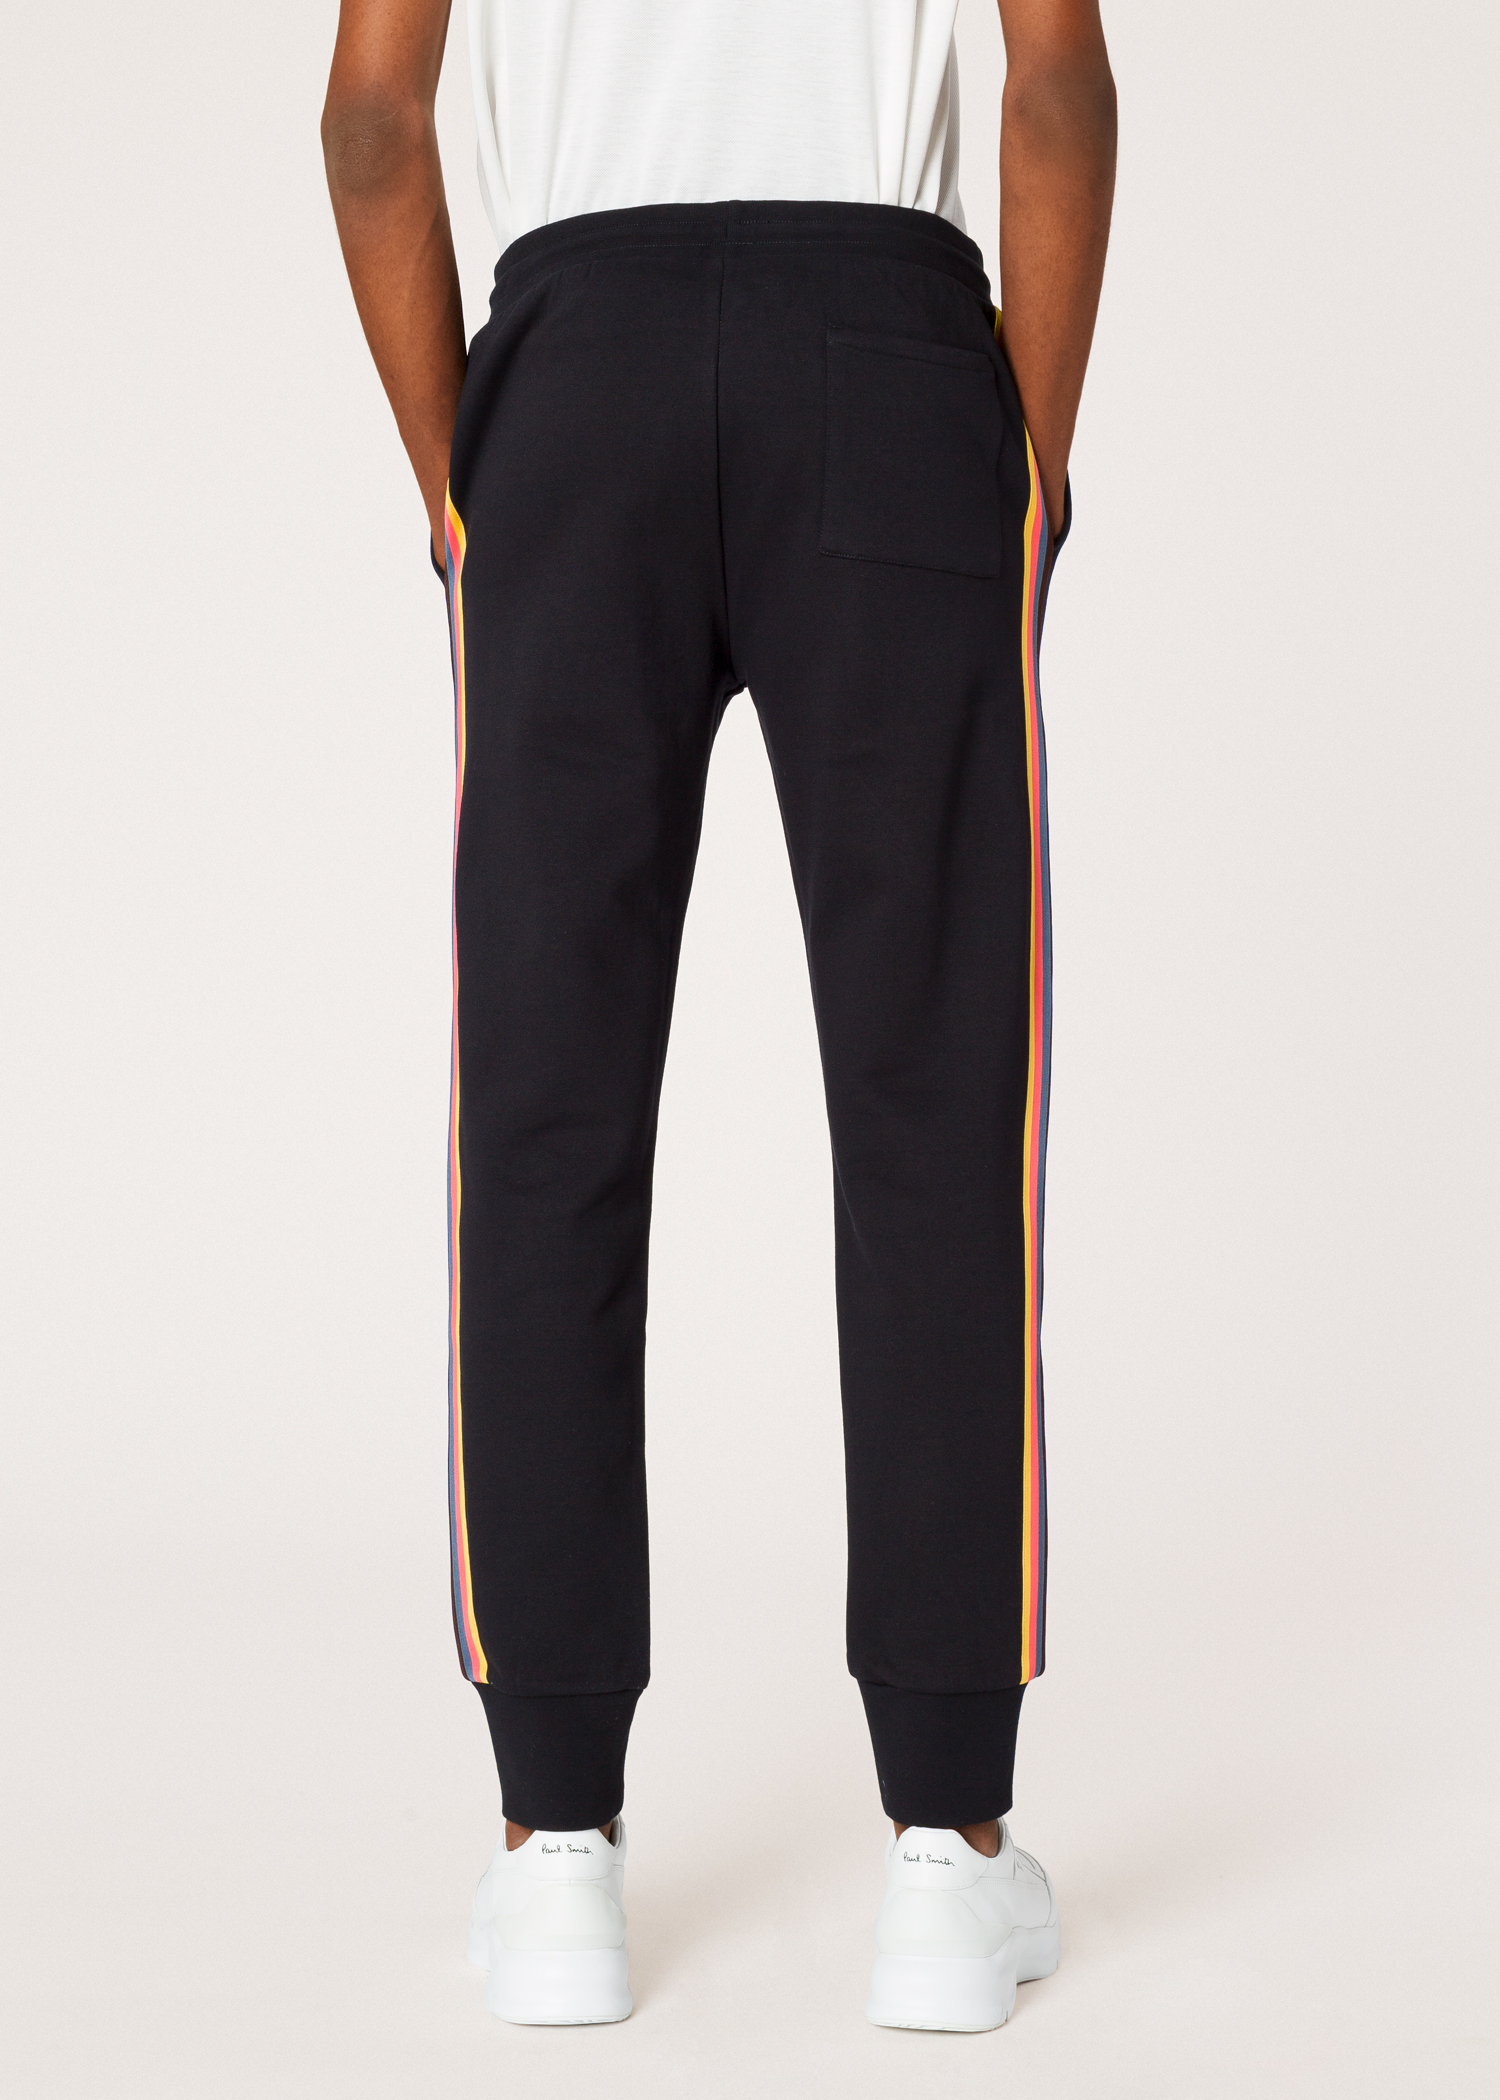 72624aef6f54 Model Back View - Men s Black  Artist Stripe  Side Cotton Sweatpants ...